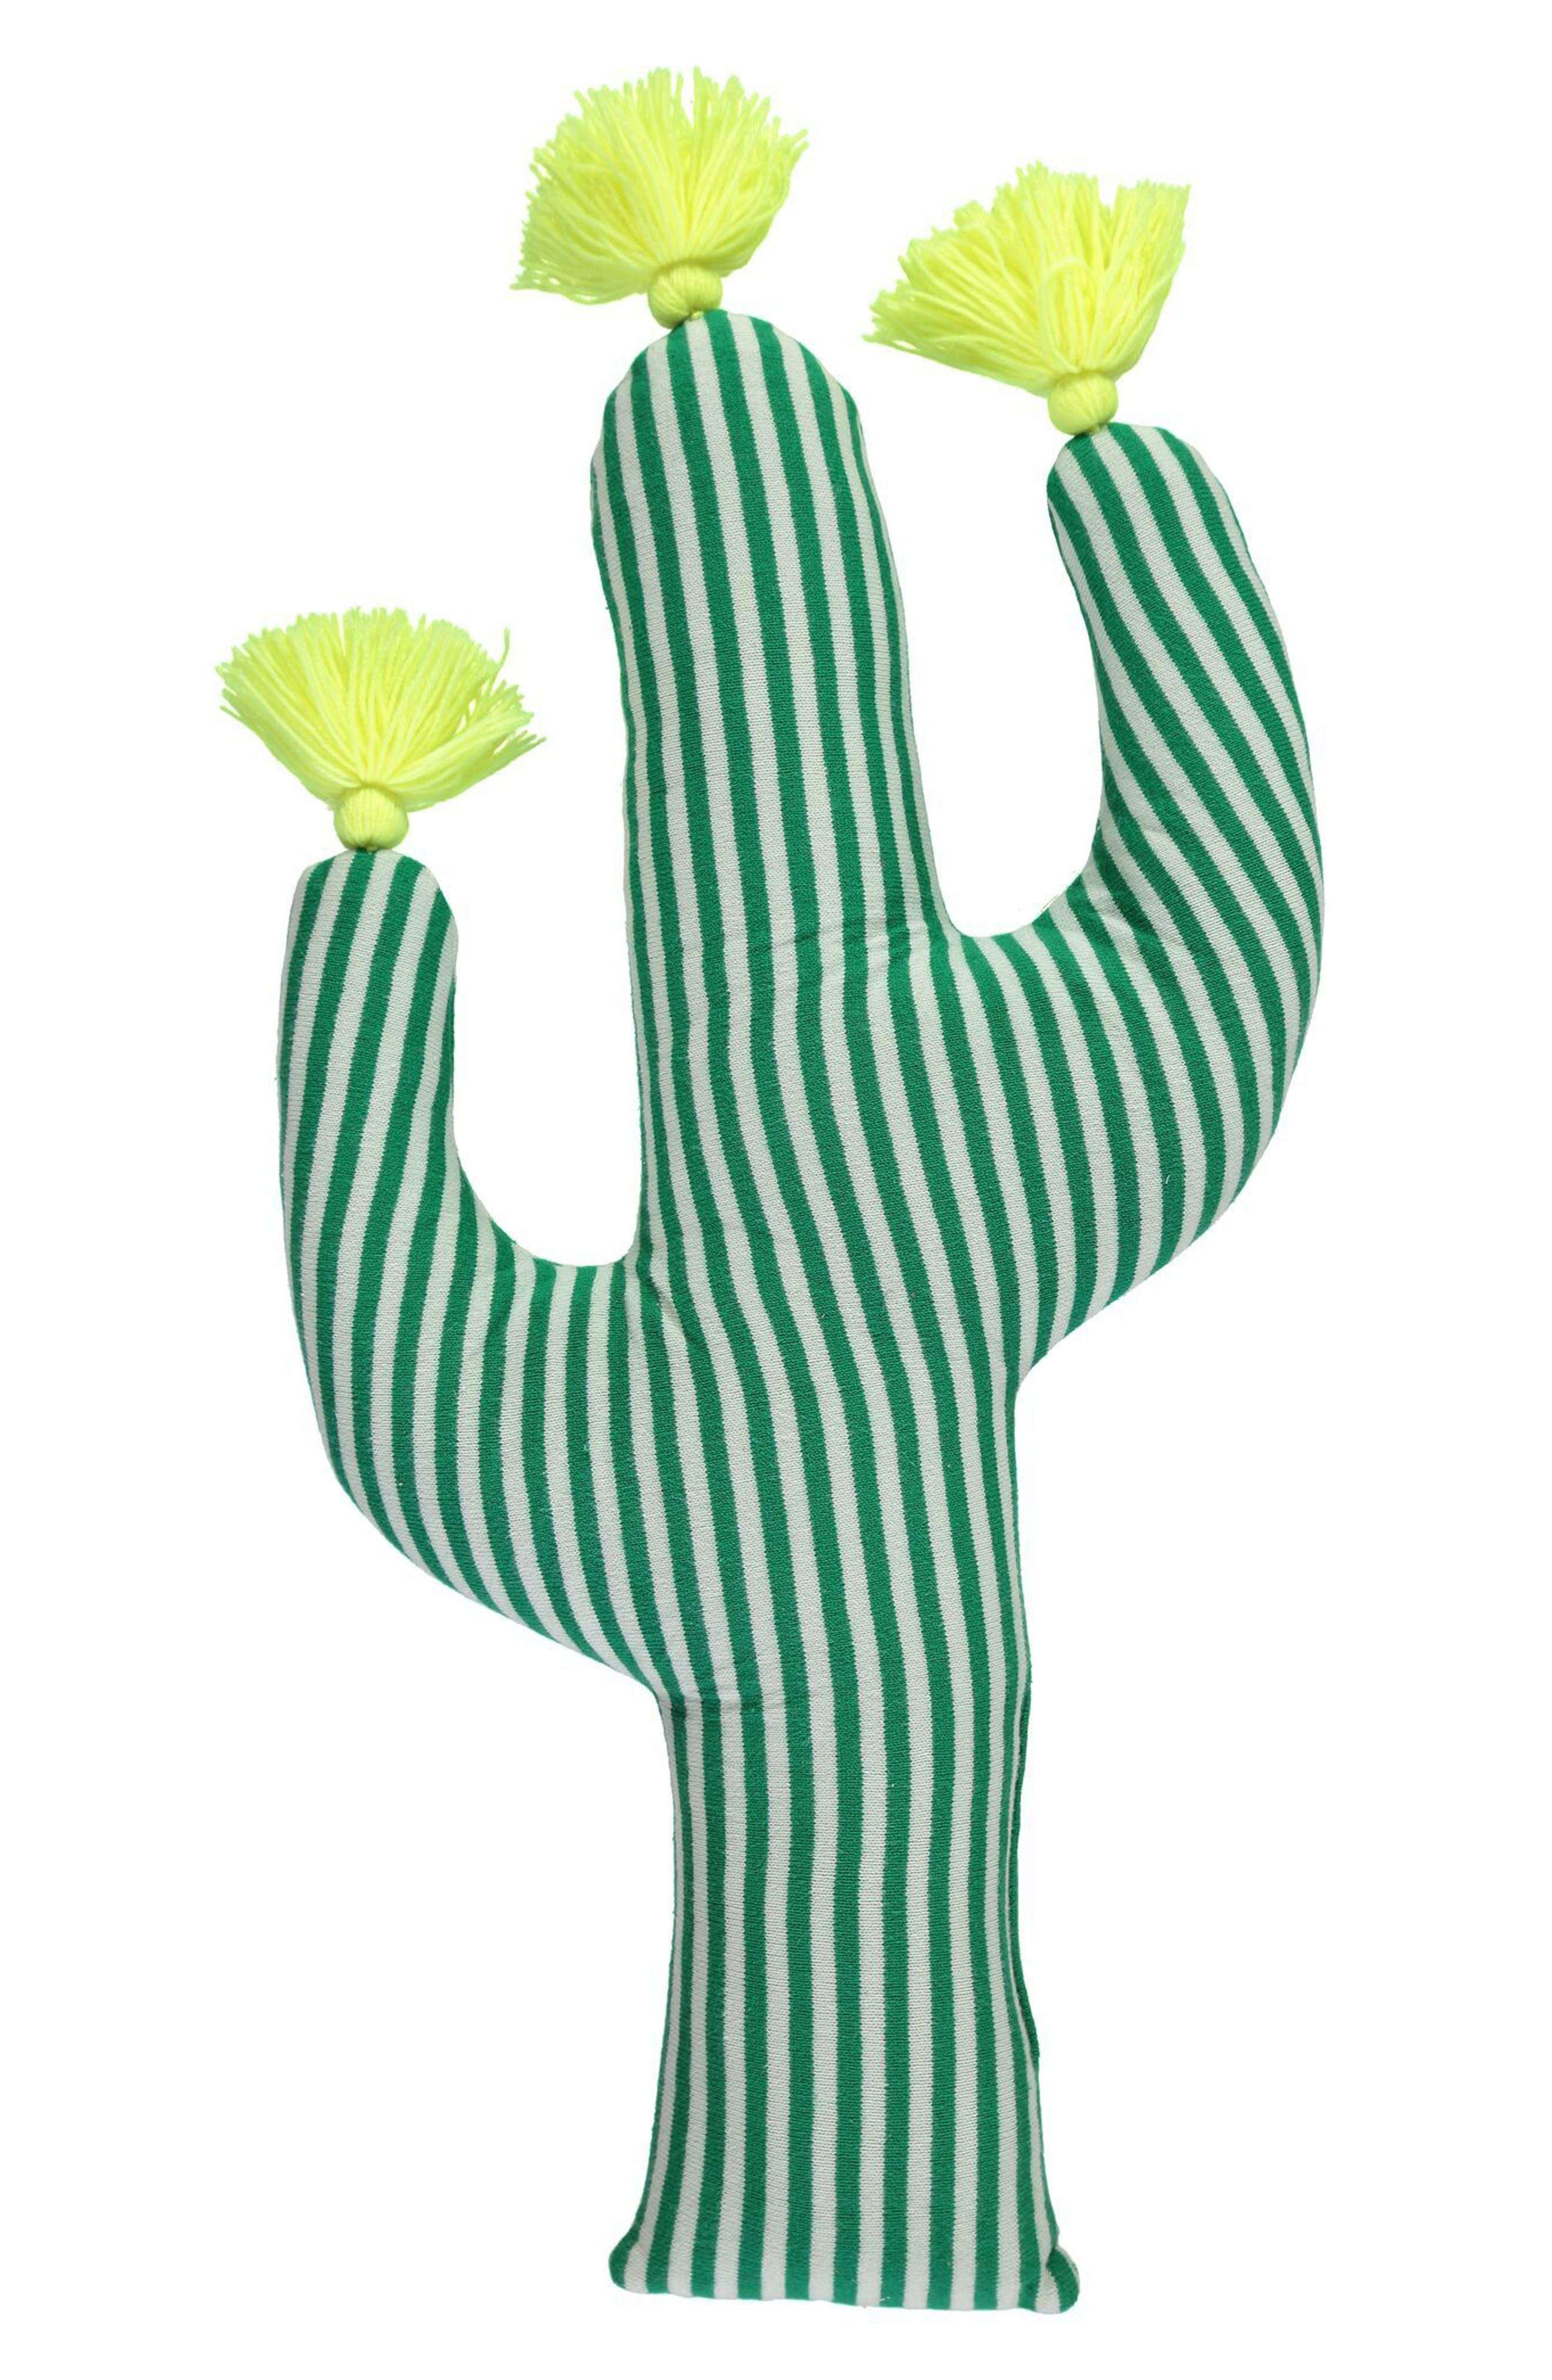 Knit Organic Cotton Cactus Cushion,                         Main,                         color, Green